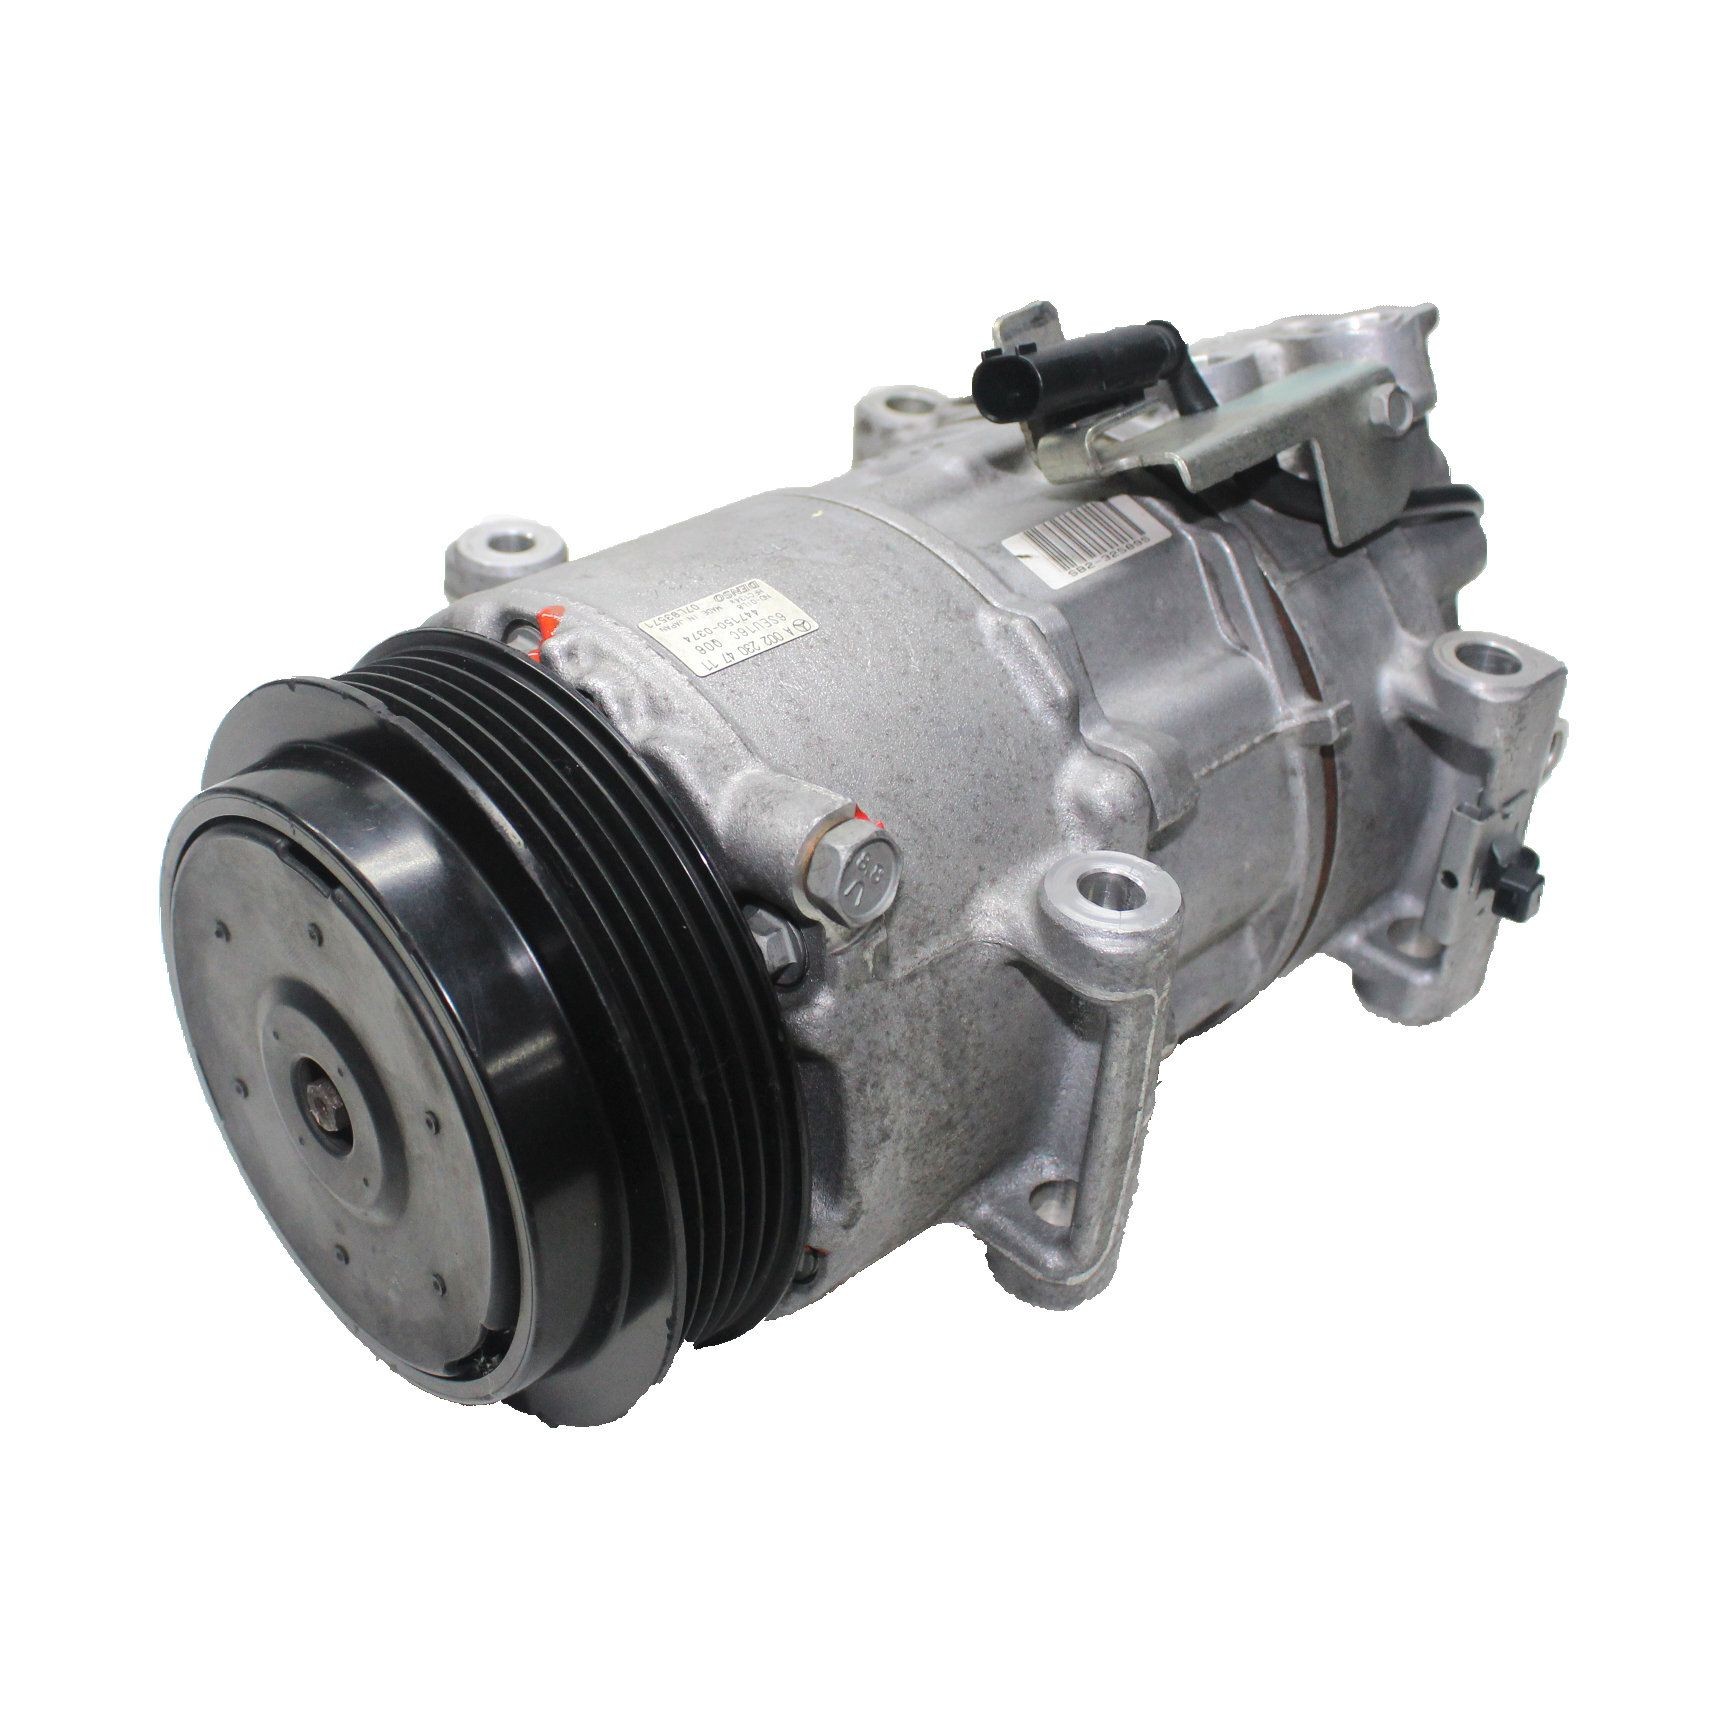 Compressor Ar Condicionado Denso Mercedes B200 - Recon